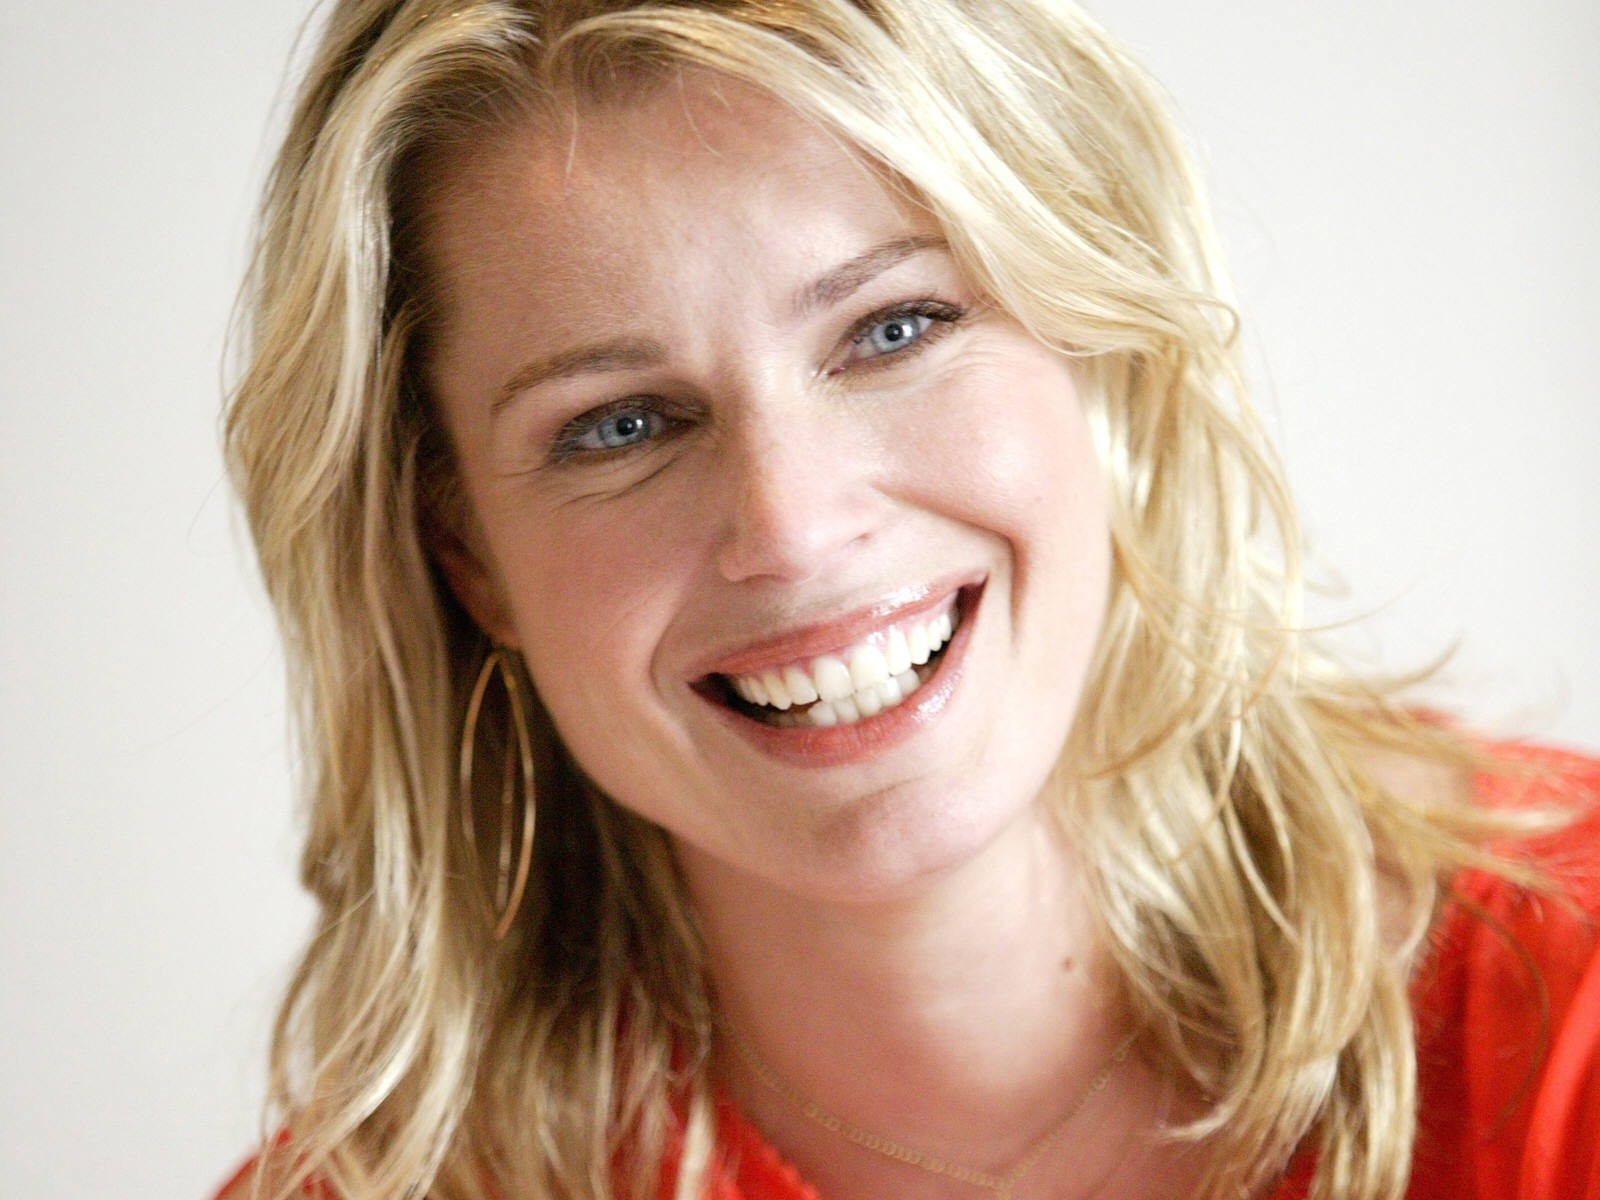 Wallpaper: una sorridente Rebecca Romijn